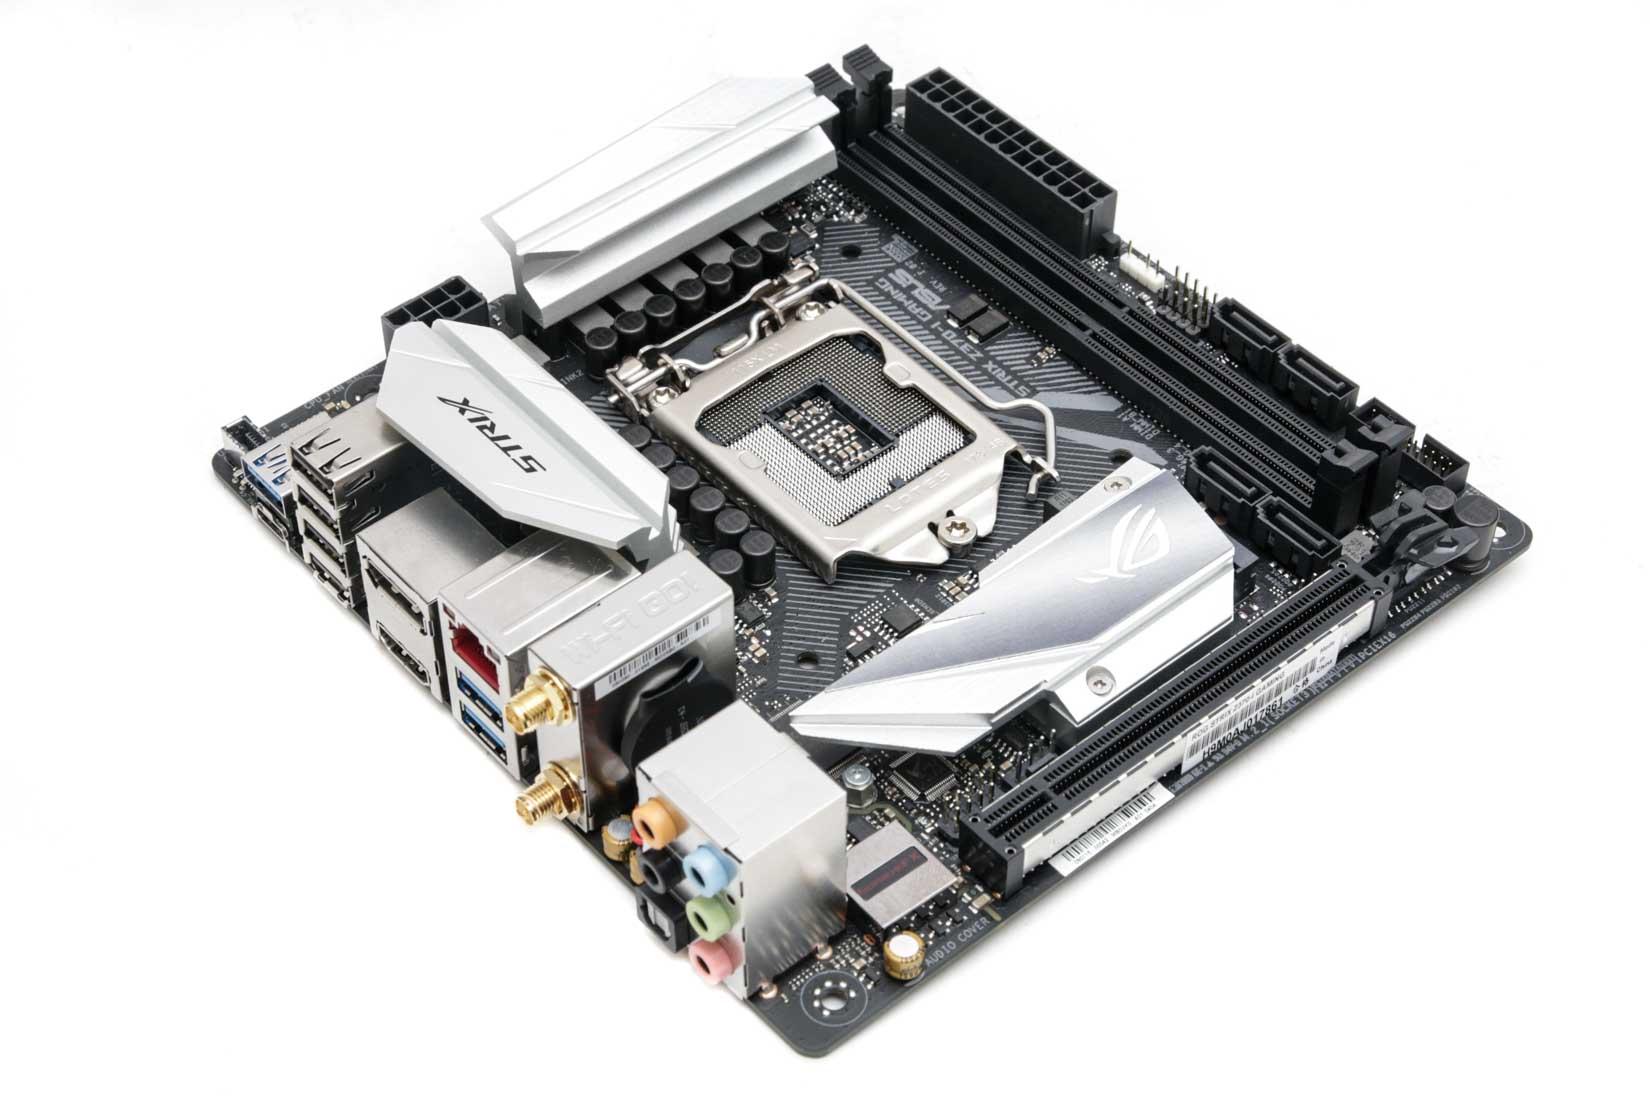 Asus ROG Strix Z370-I Gaming Review | bit-tech net